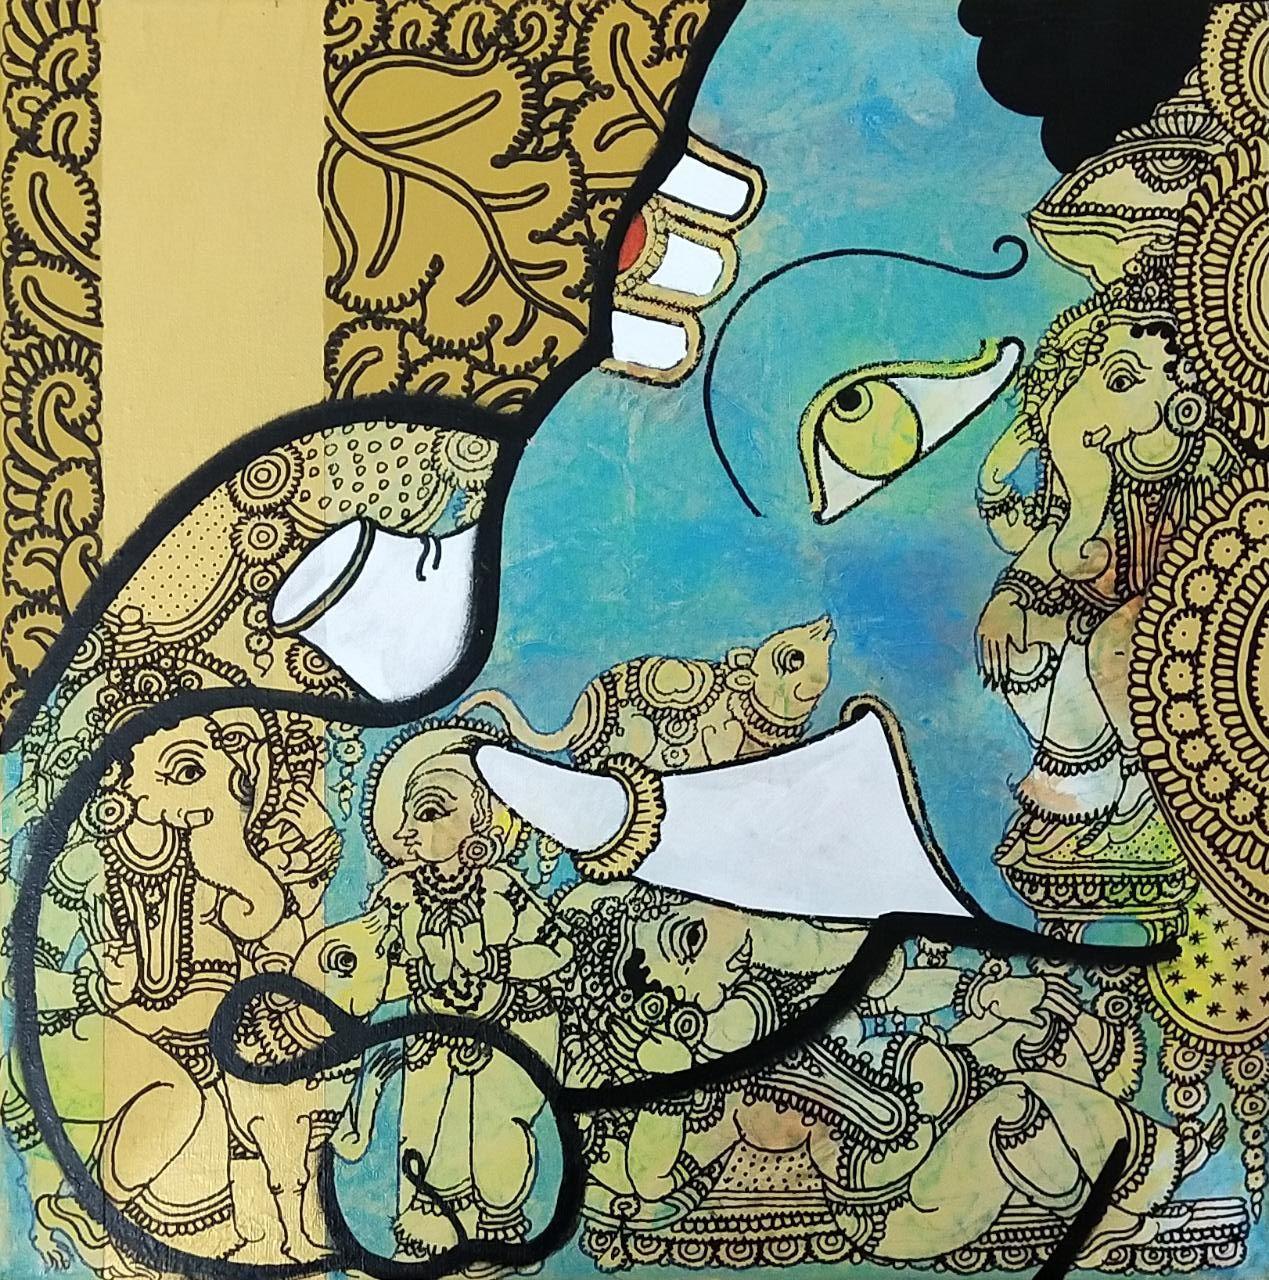 Artist name ramesh gorjala medium acrylic on canvas size